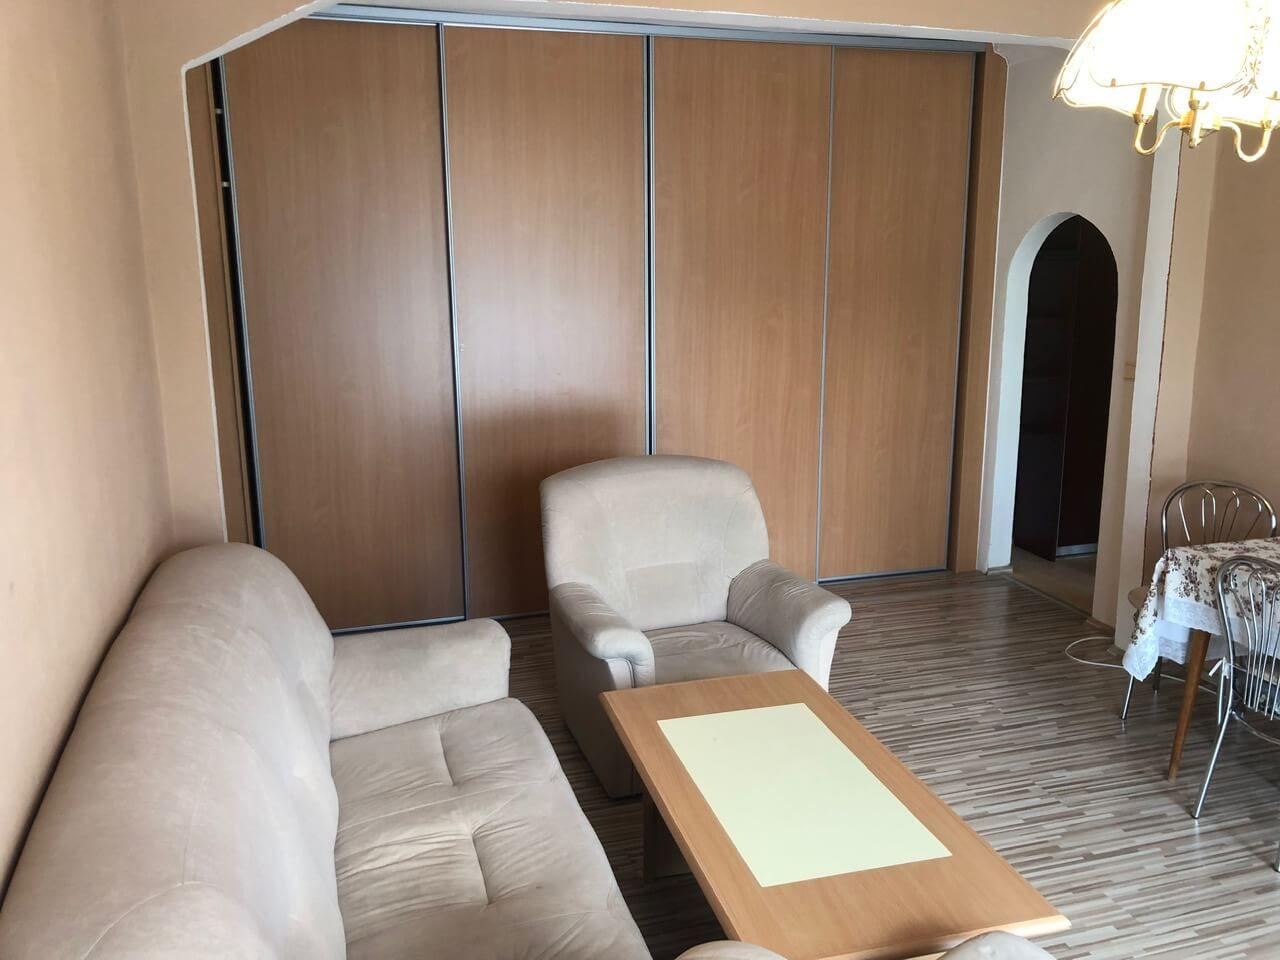 3 izbový byt, Račianska 85, 63m2, balkon 10m2, výborná lokalita-37